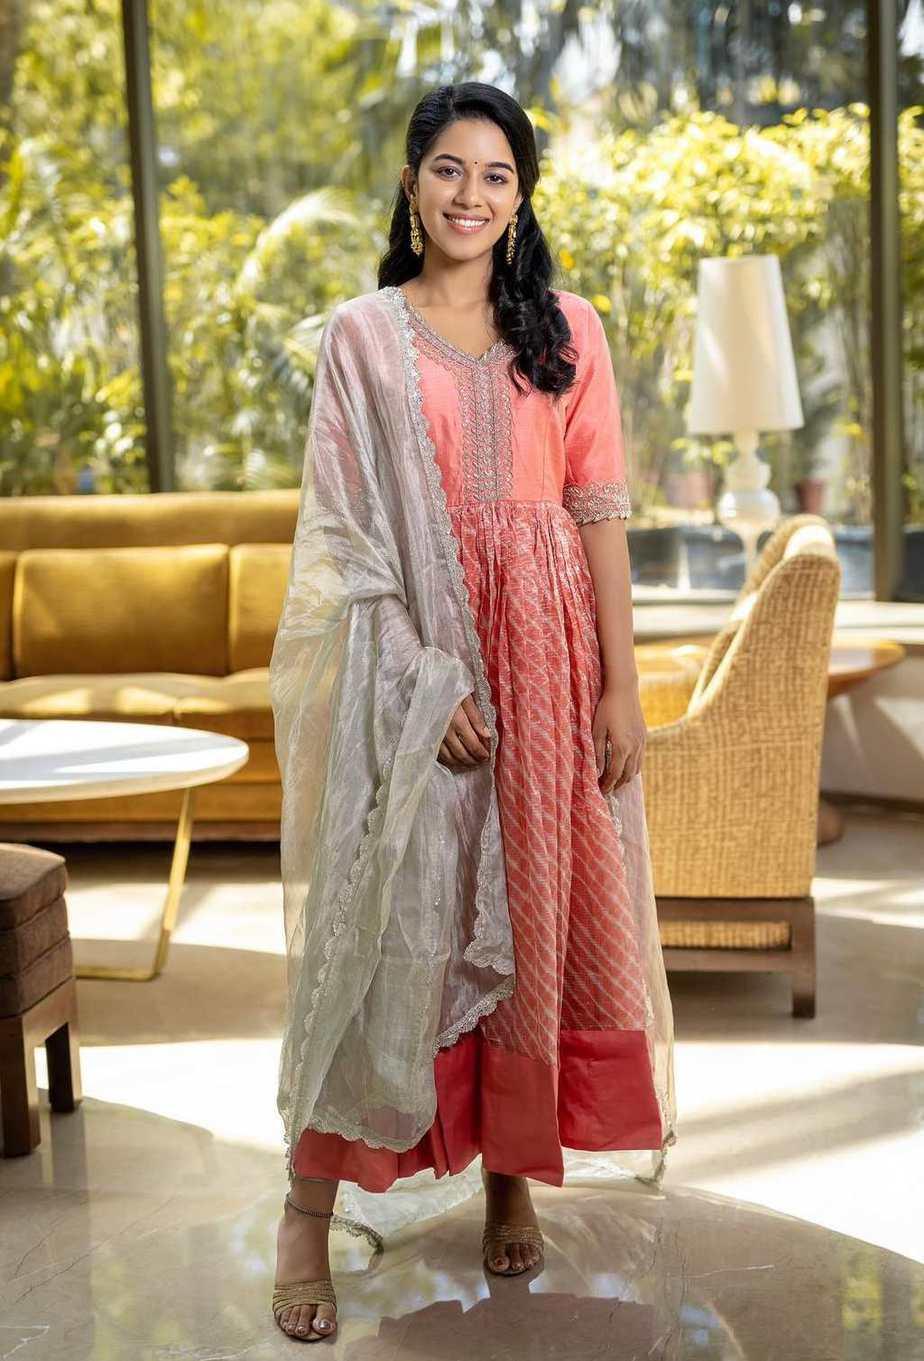 Mirnalini Ravi in a peach salwar suit by AARNA LABEL-1